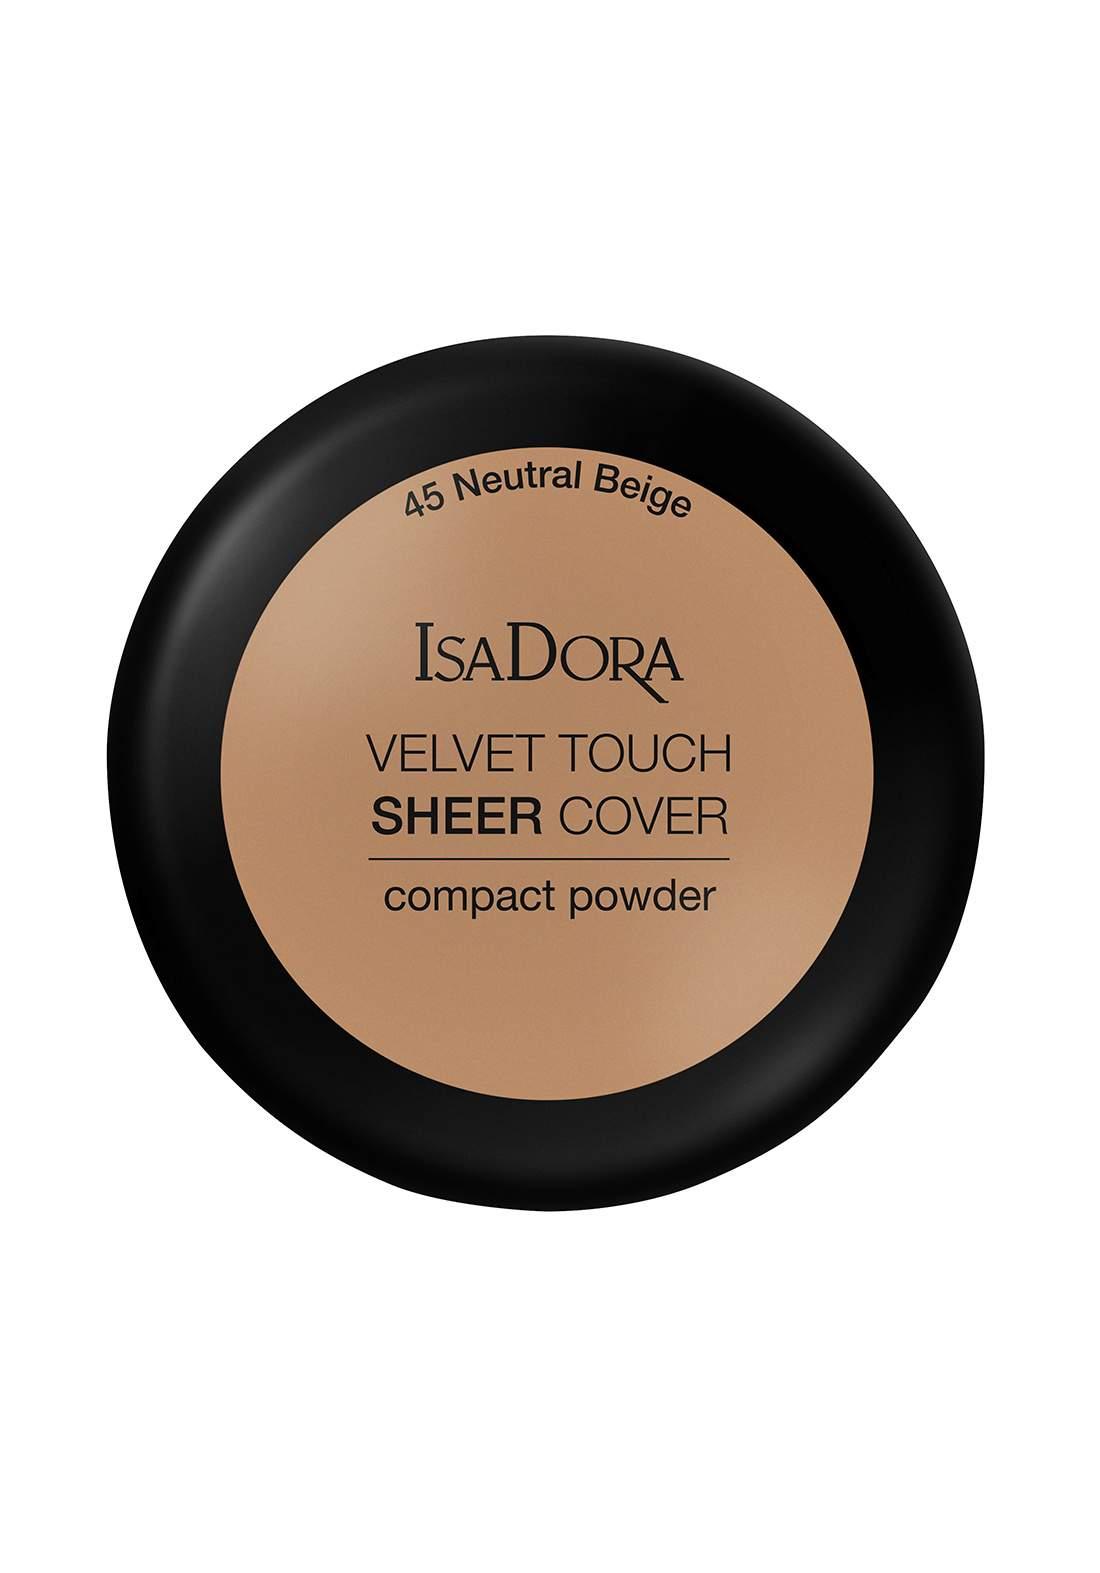 IsaDora 317109 Velvet Touch Sheer Cover Compact Powder Neutral Beige NO.45 بودرة